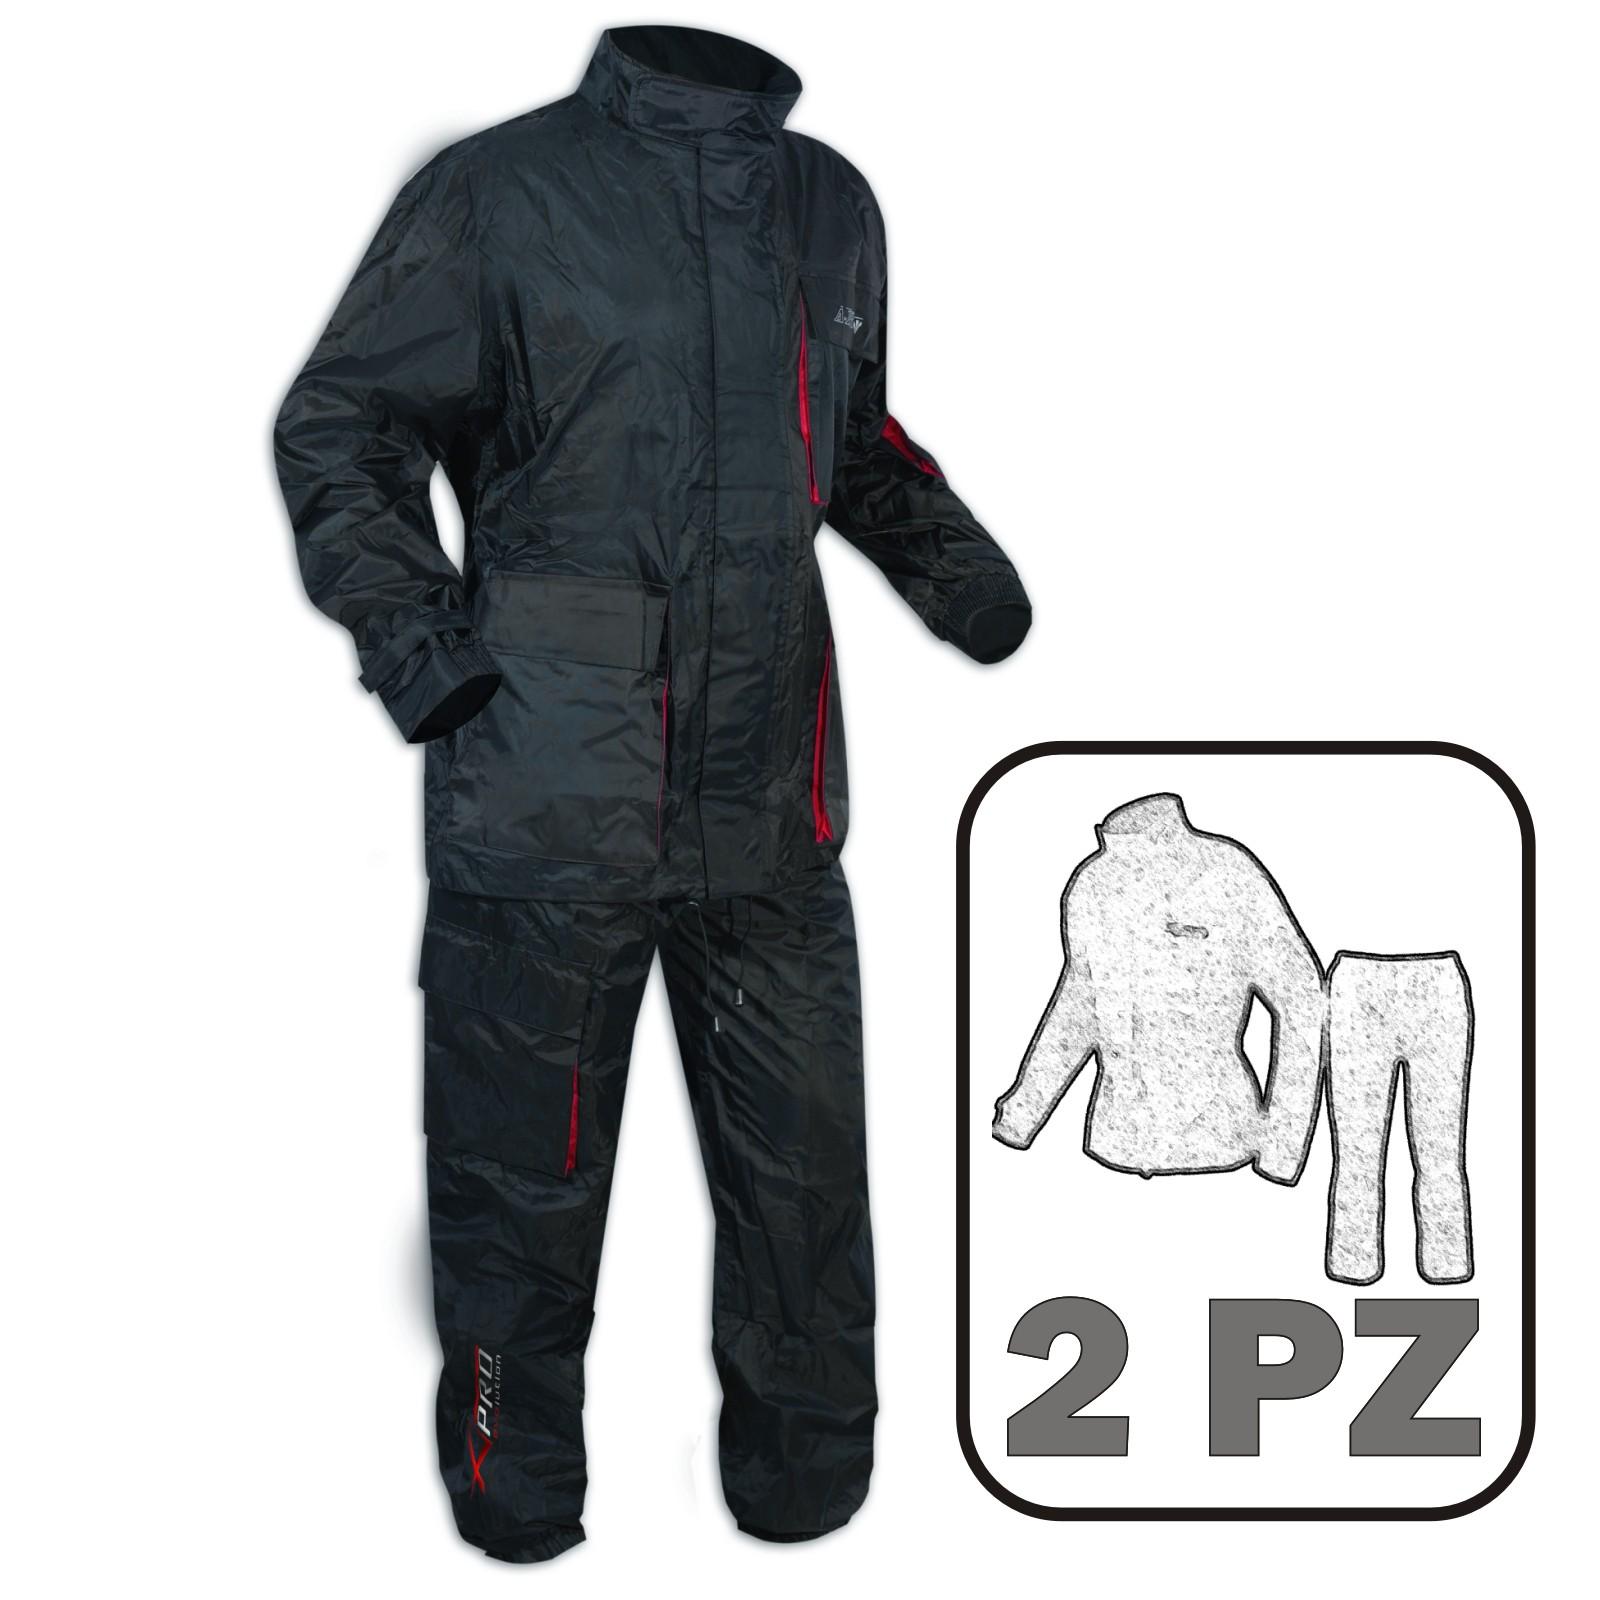 Impermeabile 2 Pezzi Anti Pioggia Tuta Pantaloni Giacca Pantoloni Moto Scooter